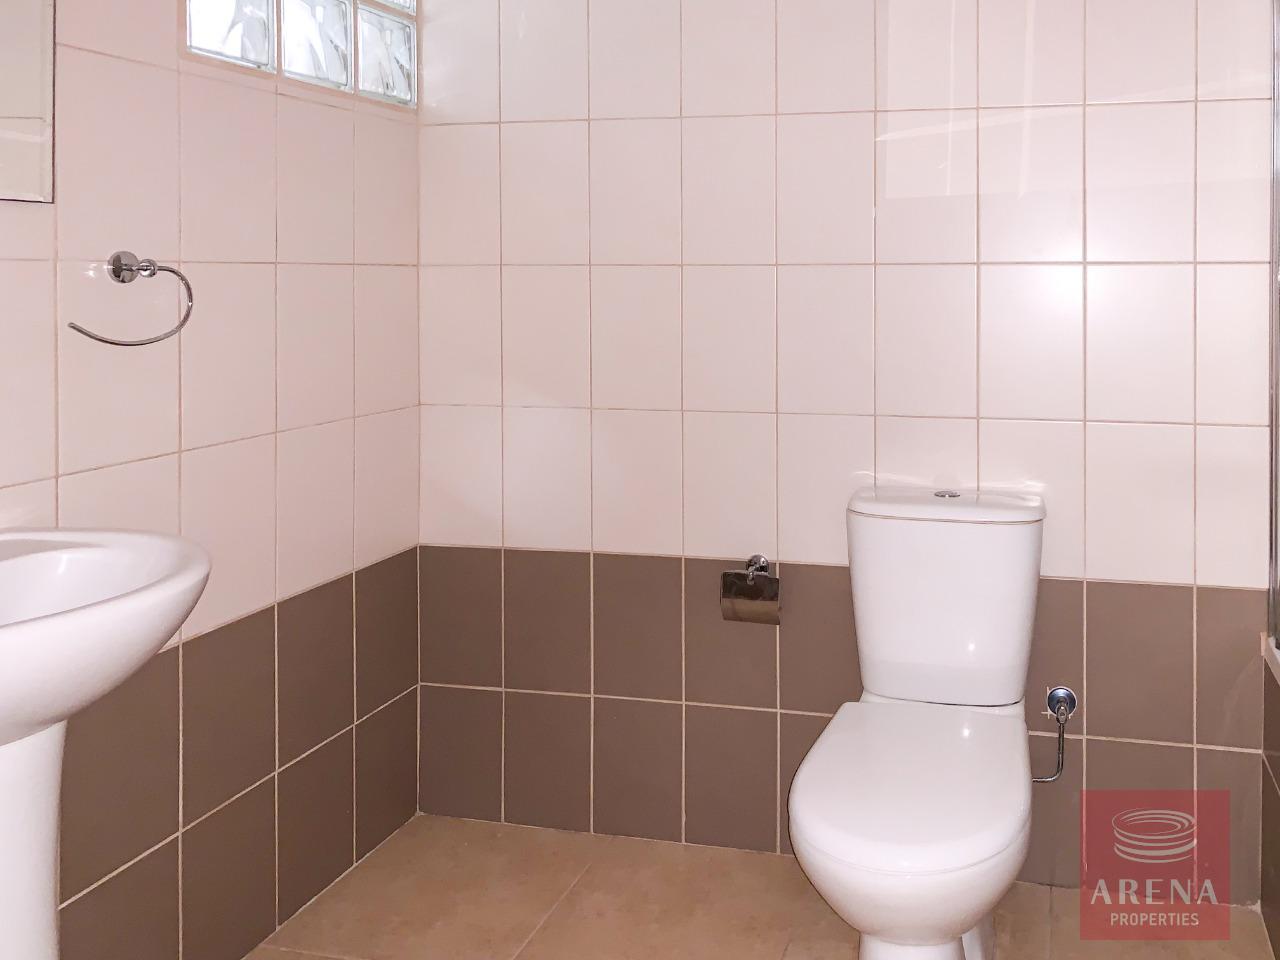 Apt for sale in Larnaca - bathroom